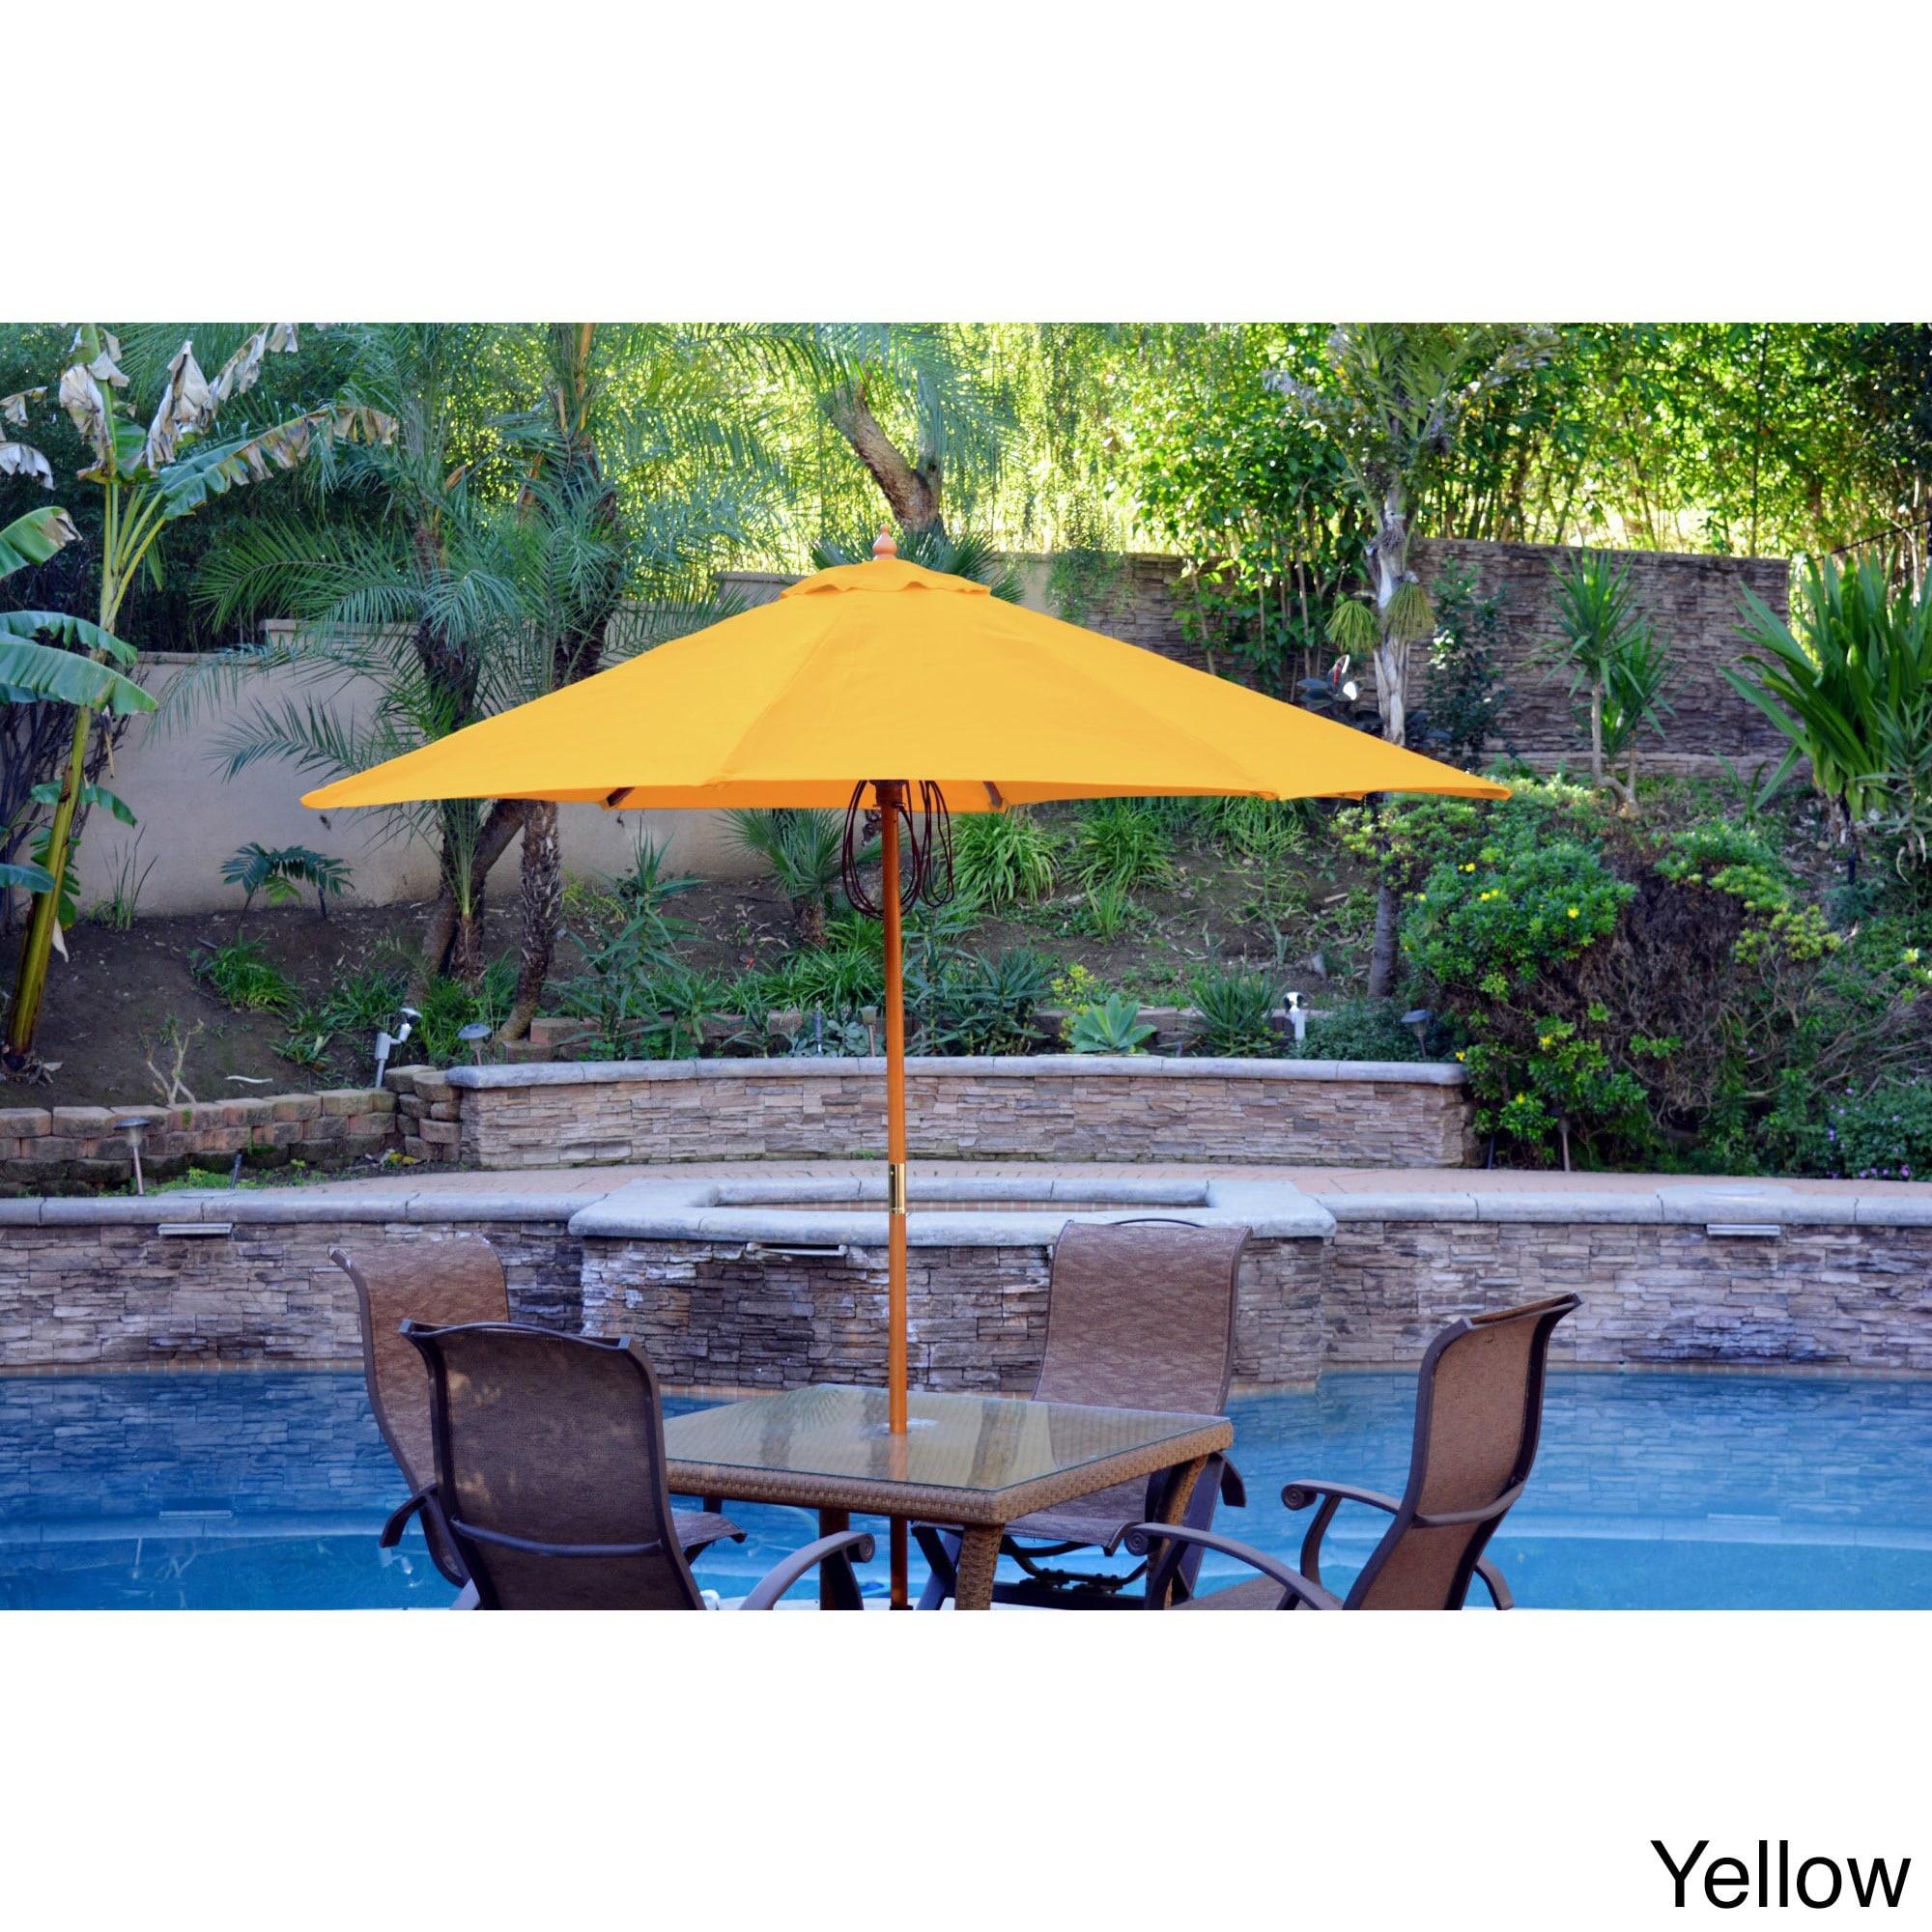 Jeco 9 foot Wood Market Patio Umbrella